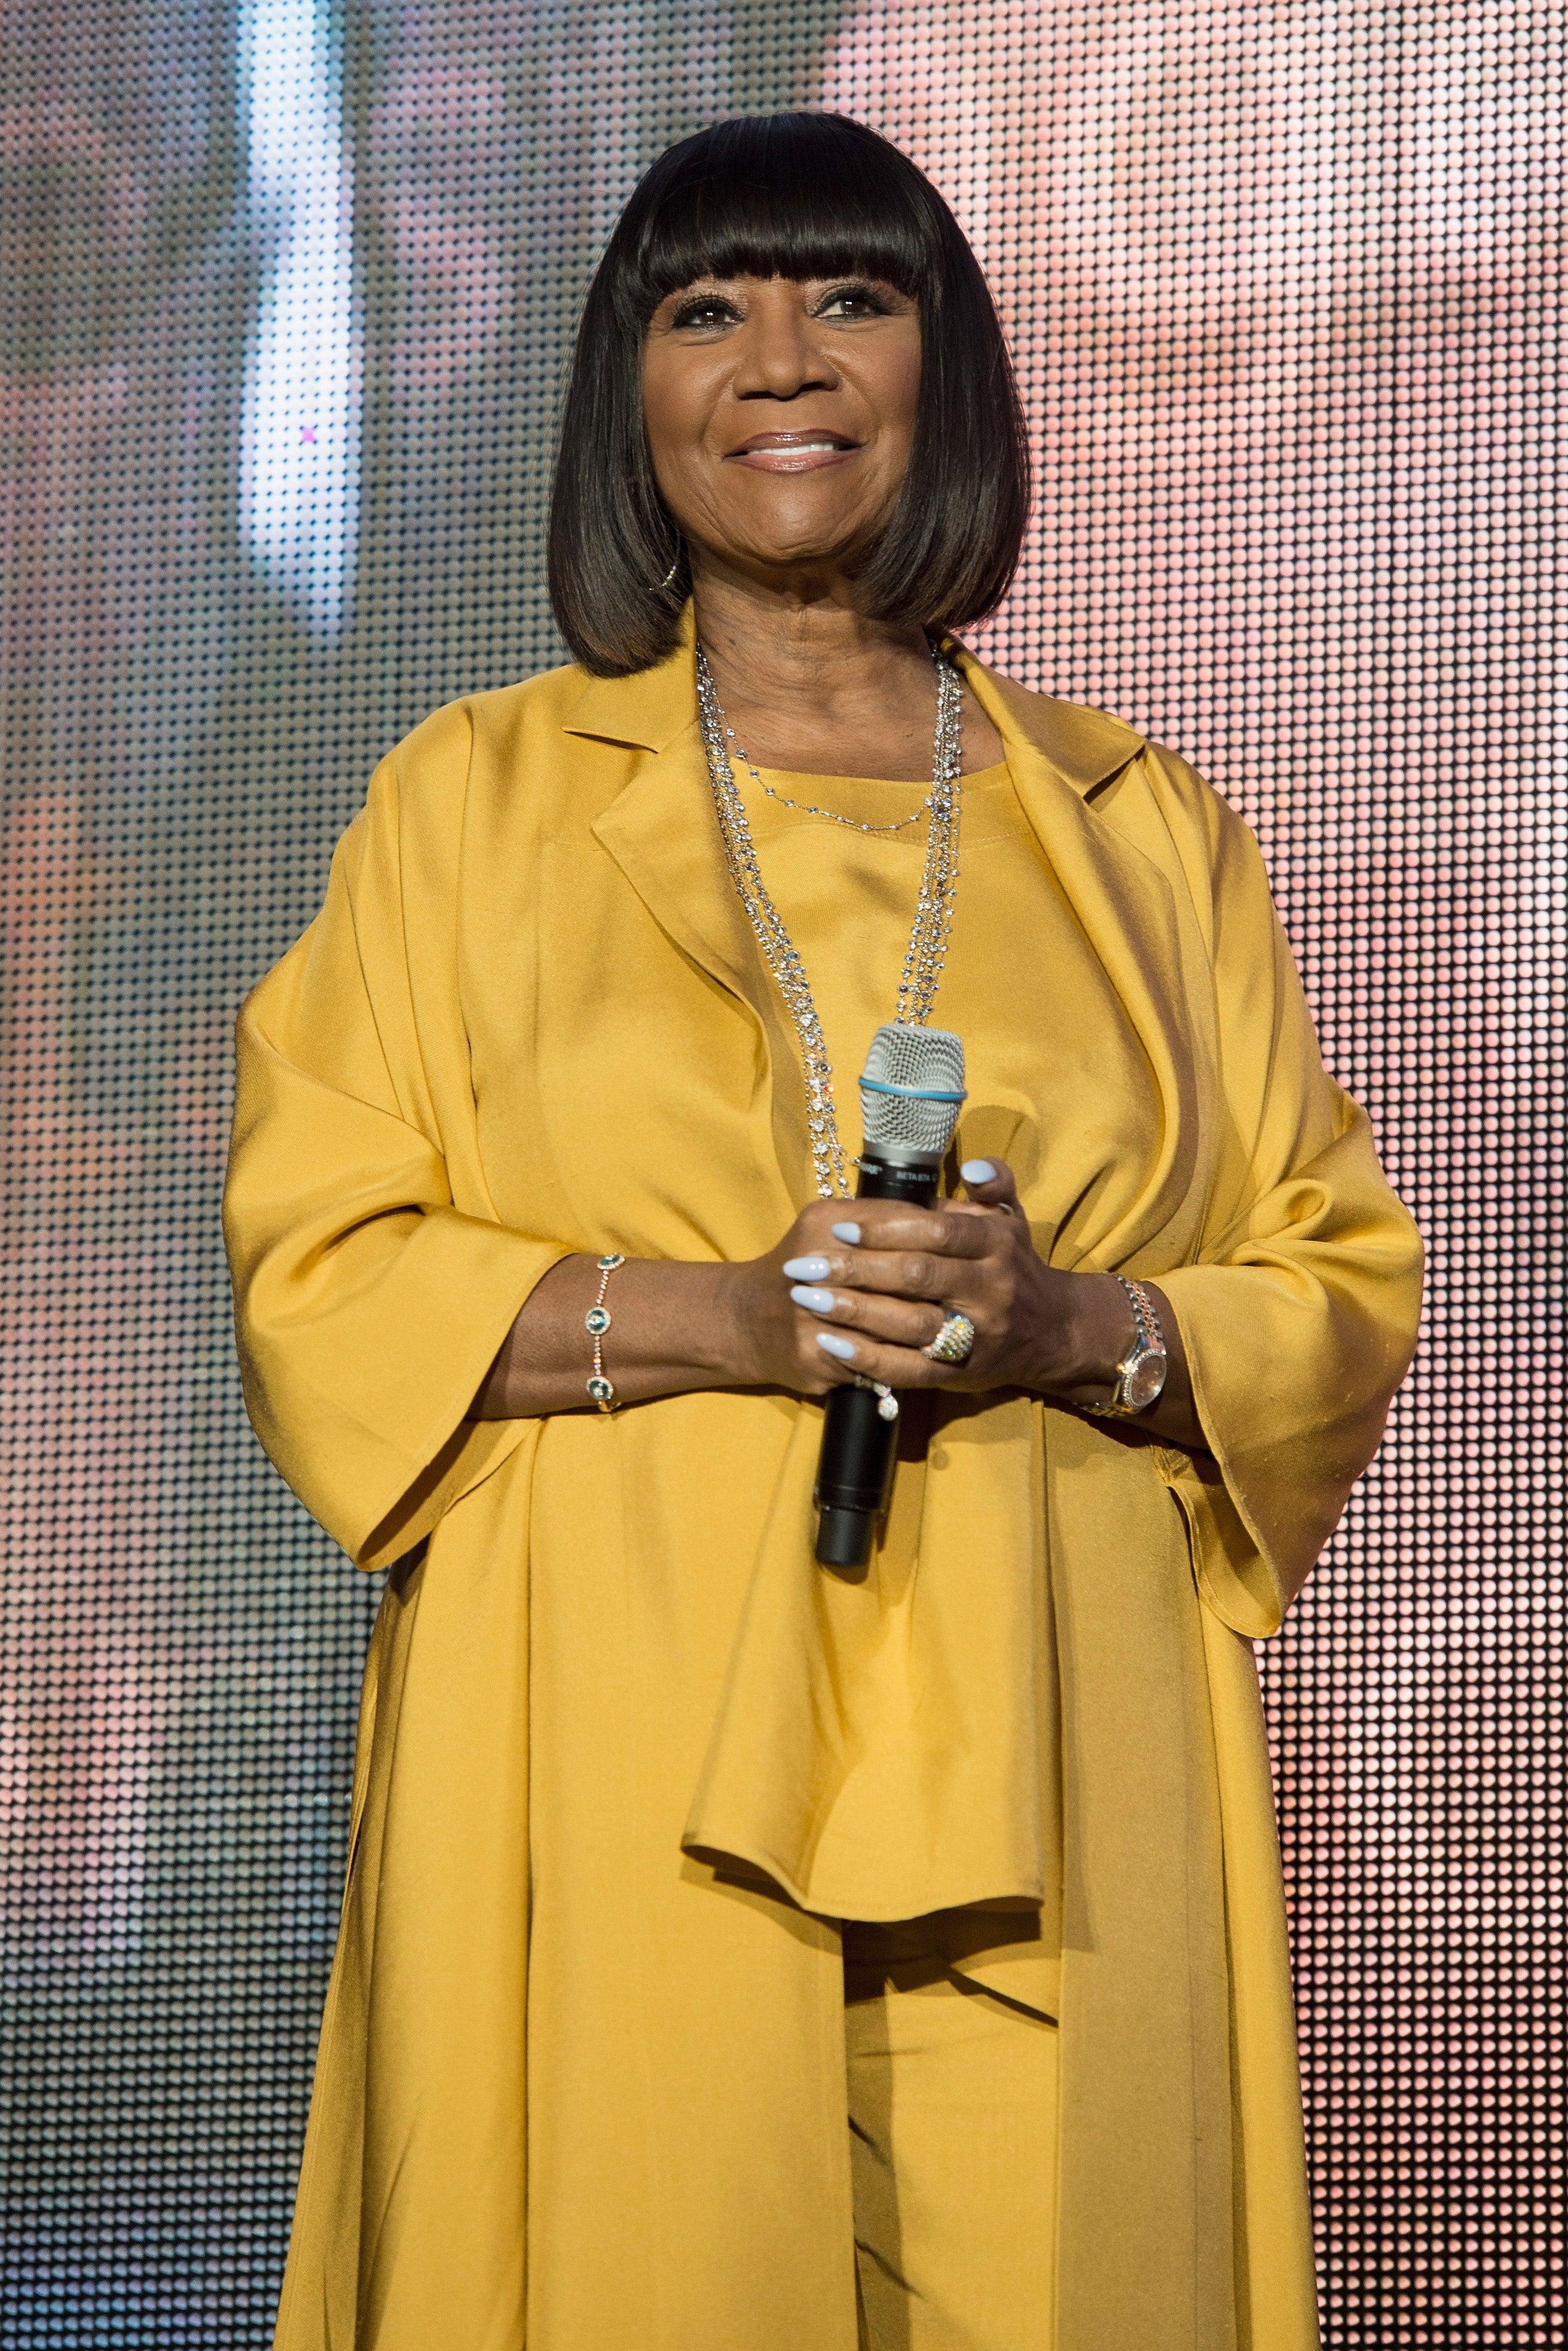 Patti LaBelle Speaks on Aretha Franklin's Retirement